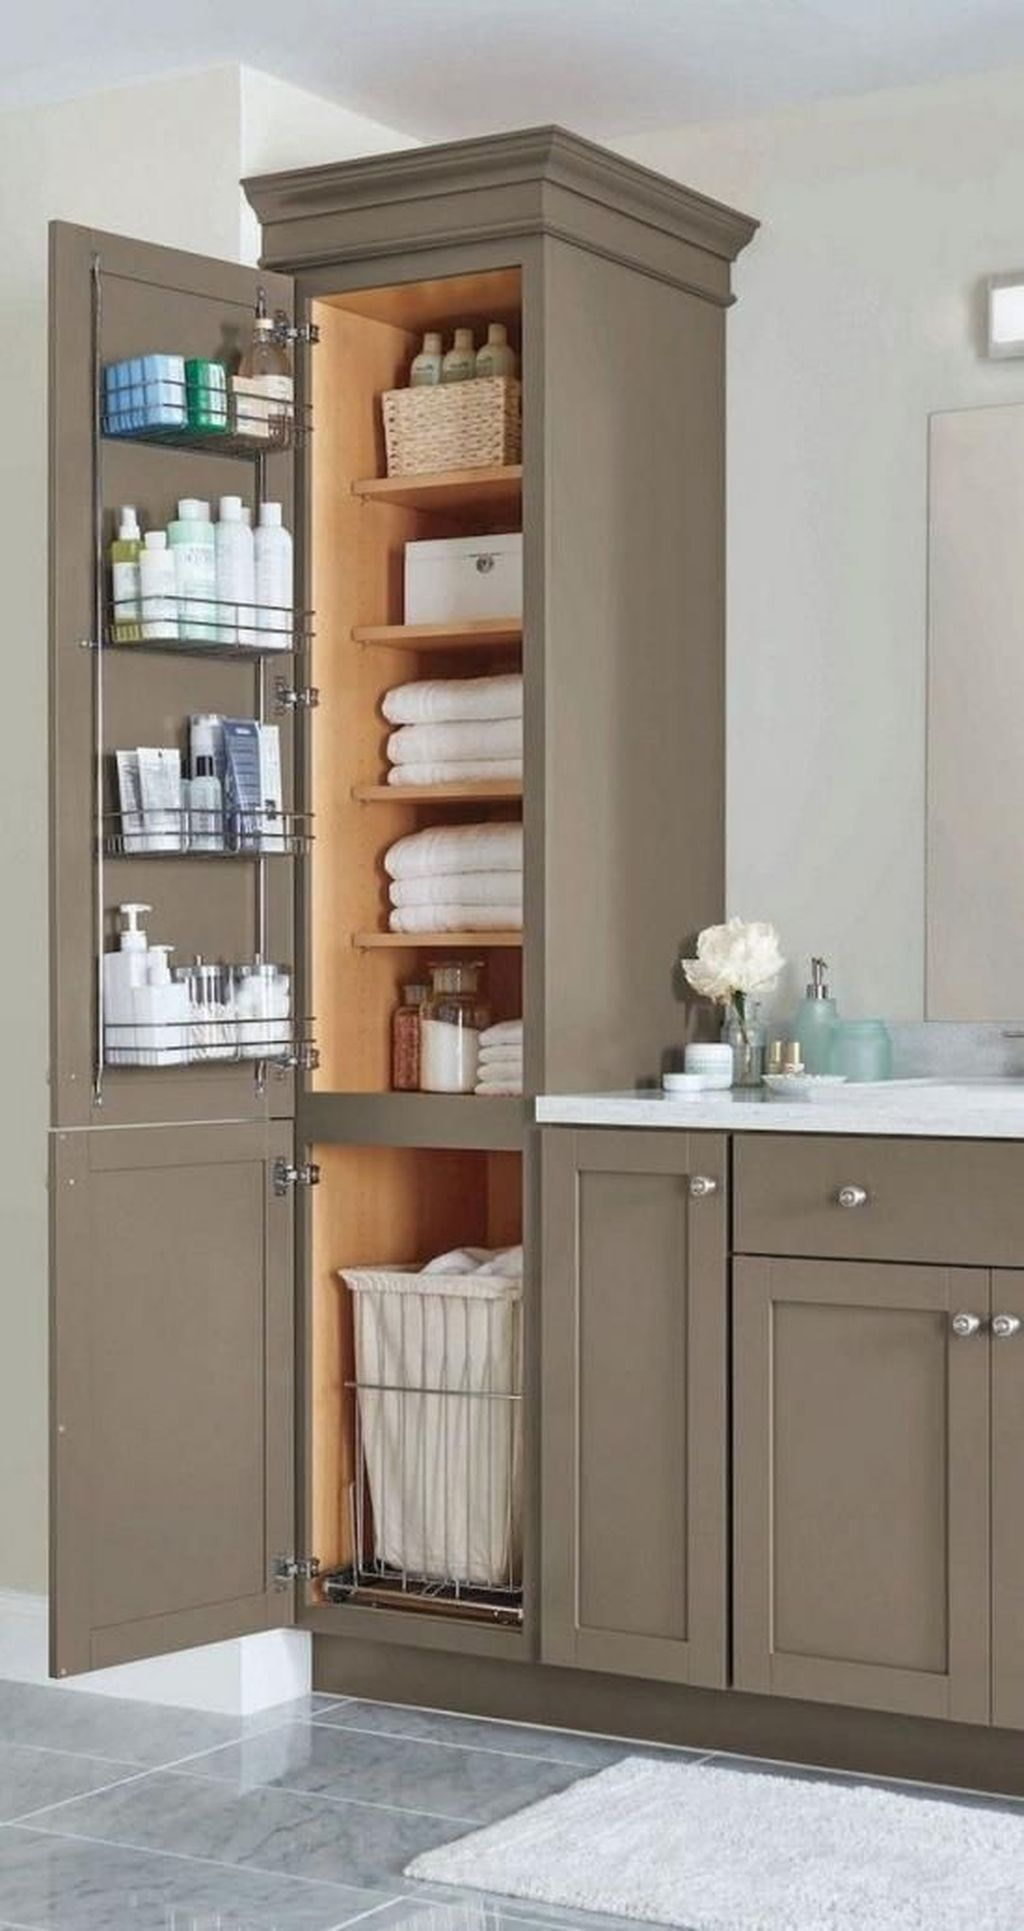 34 Amazing Modern Bathroom Storage Ideas You Must Have In 2020 Funky Bathroom Small Master Bathroom Bathroom Interior